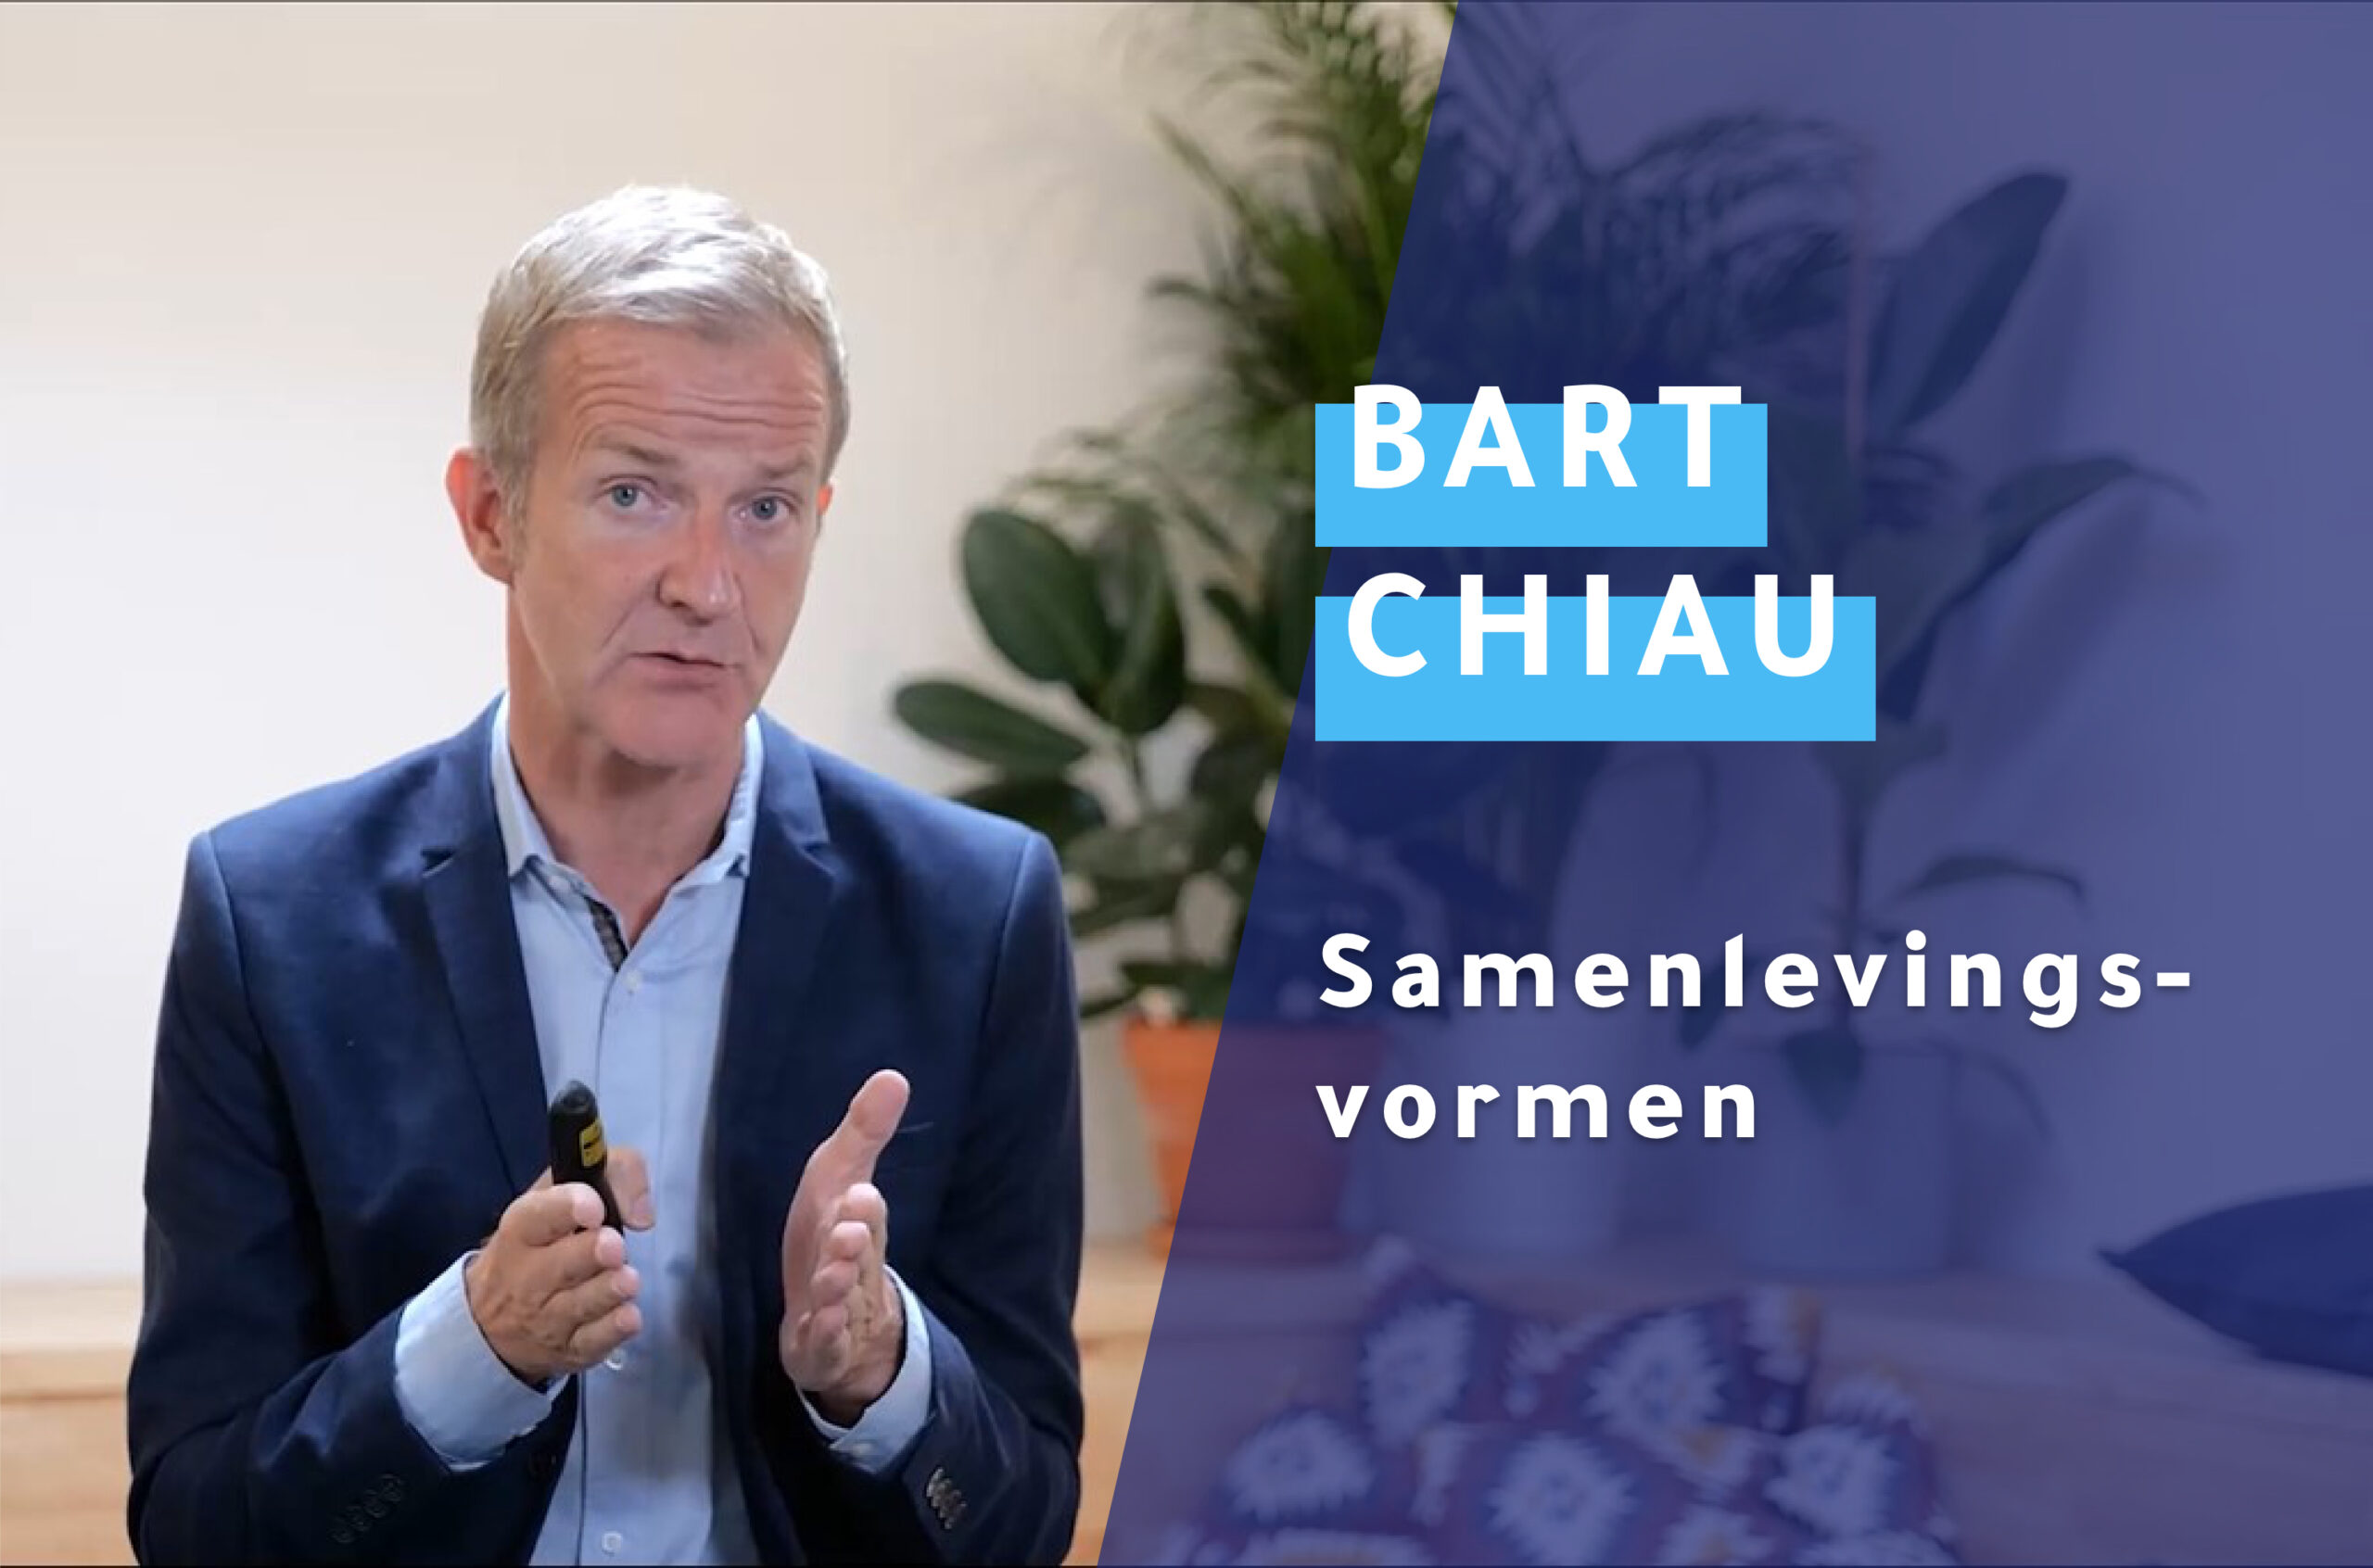 Accounting e-learning over samenlevingsvormen met Bart Chiau